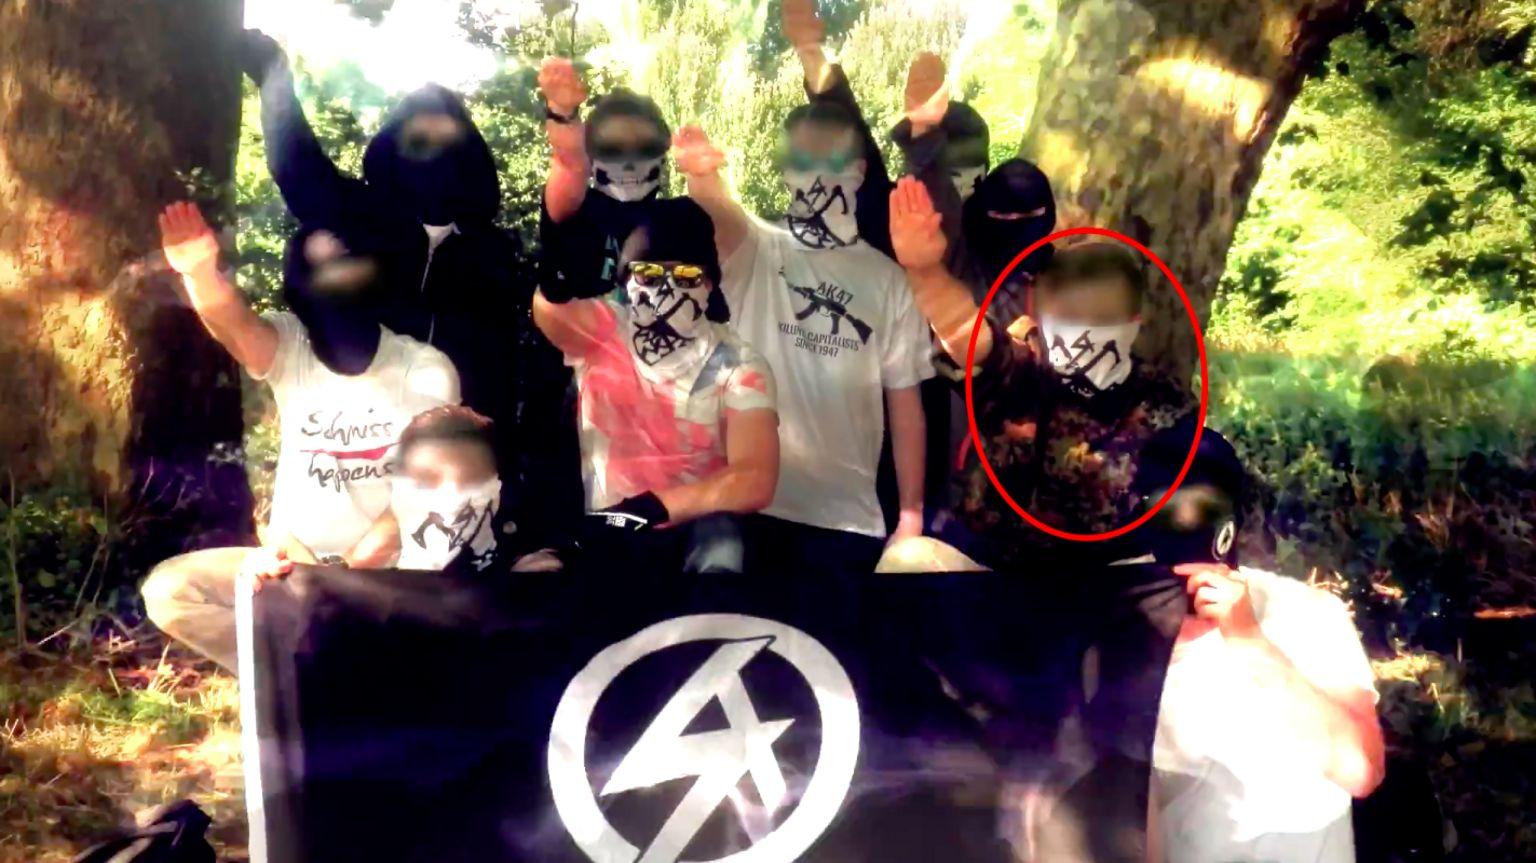 Hannam saluting in propaganda video